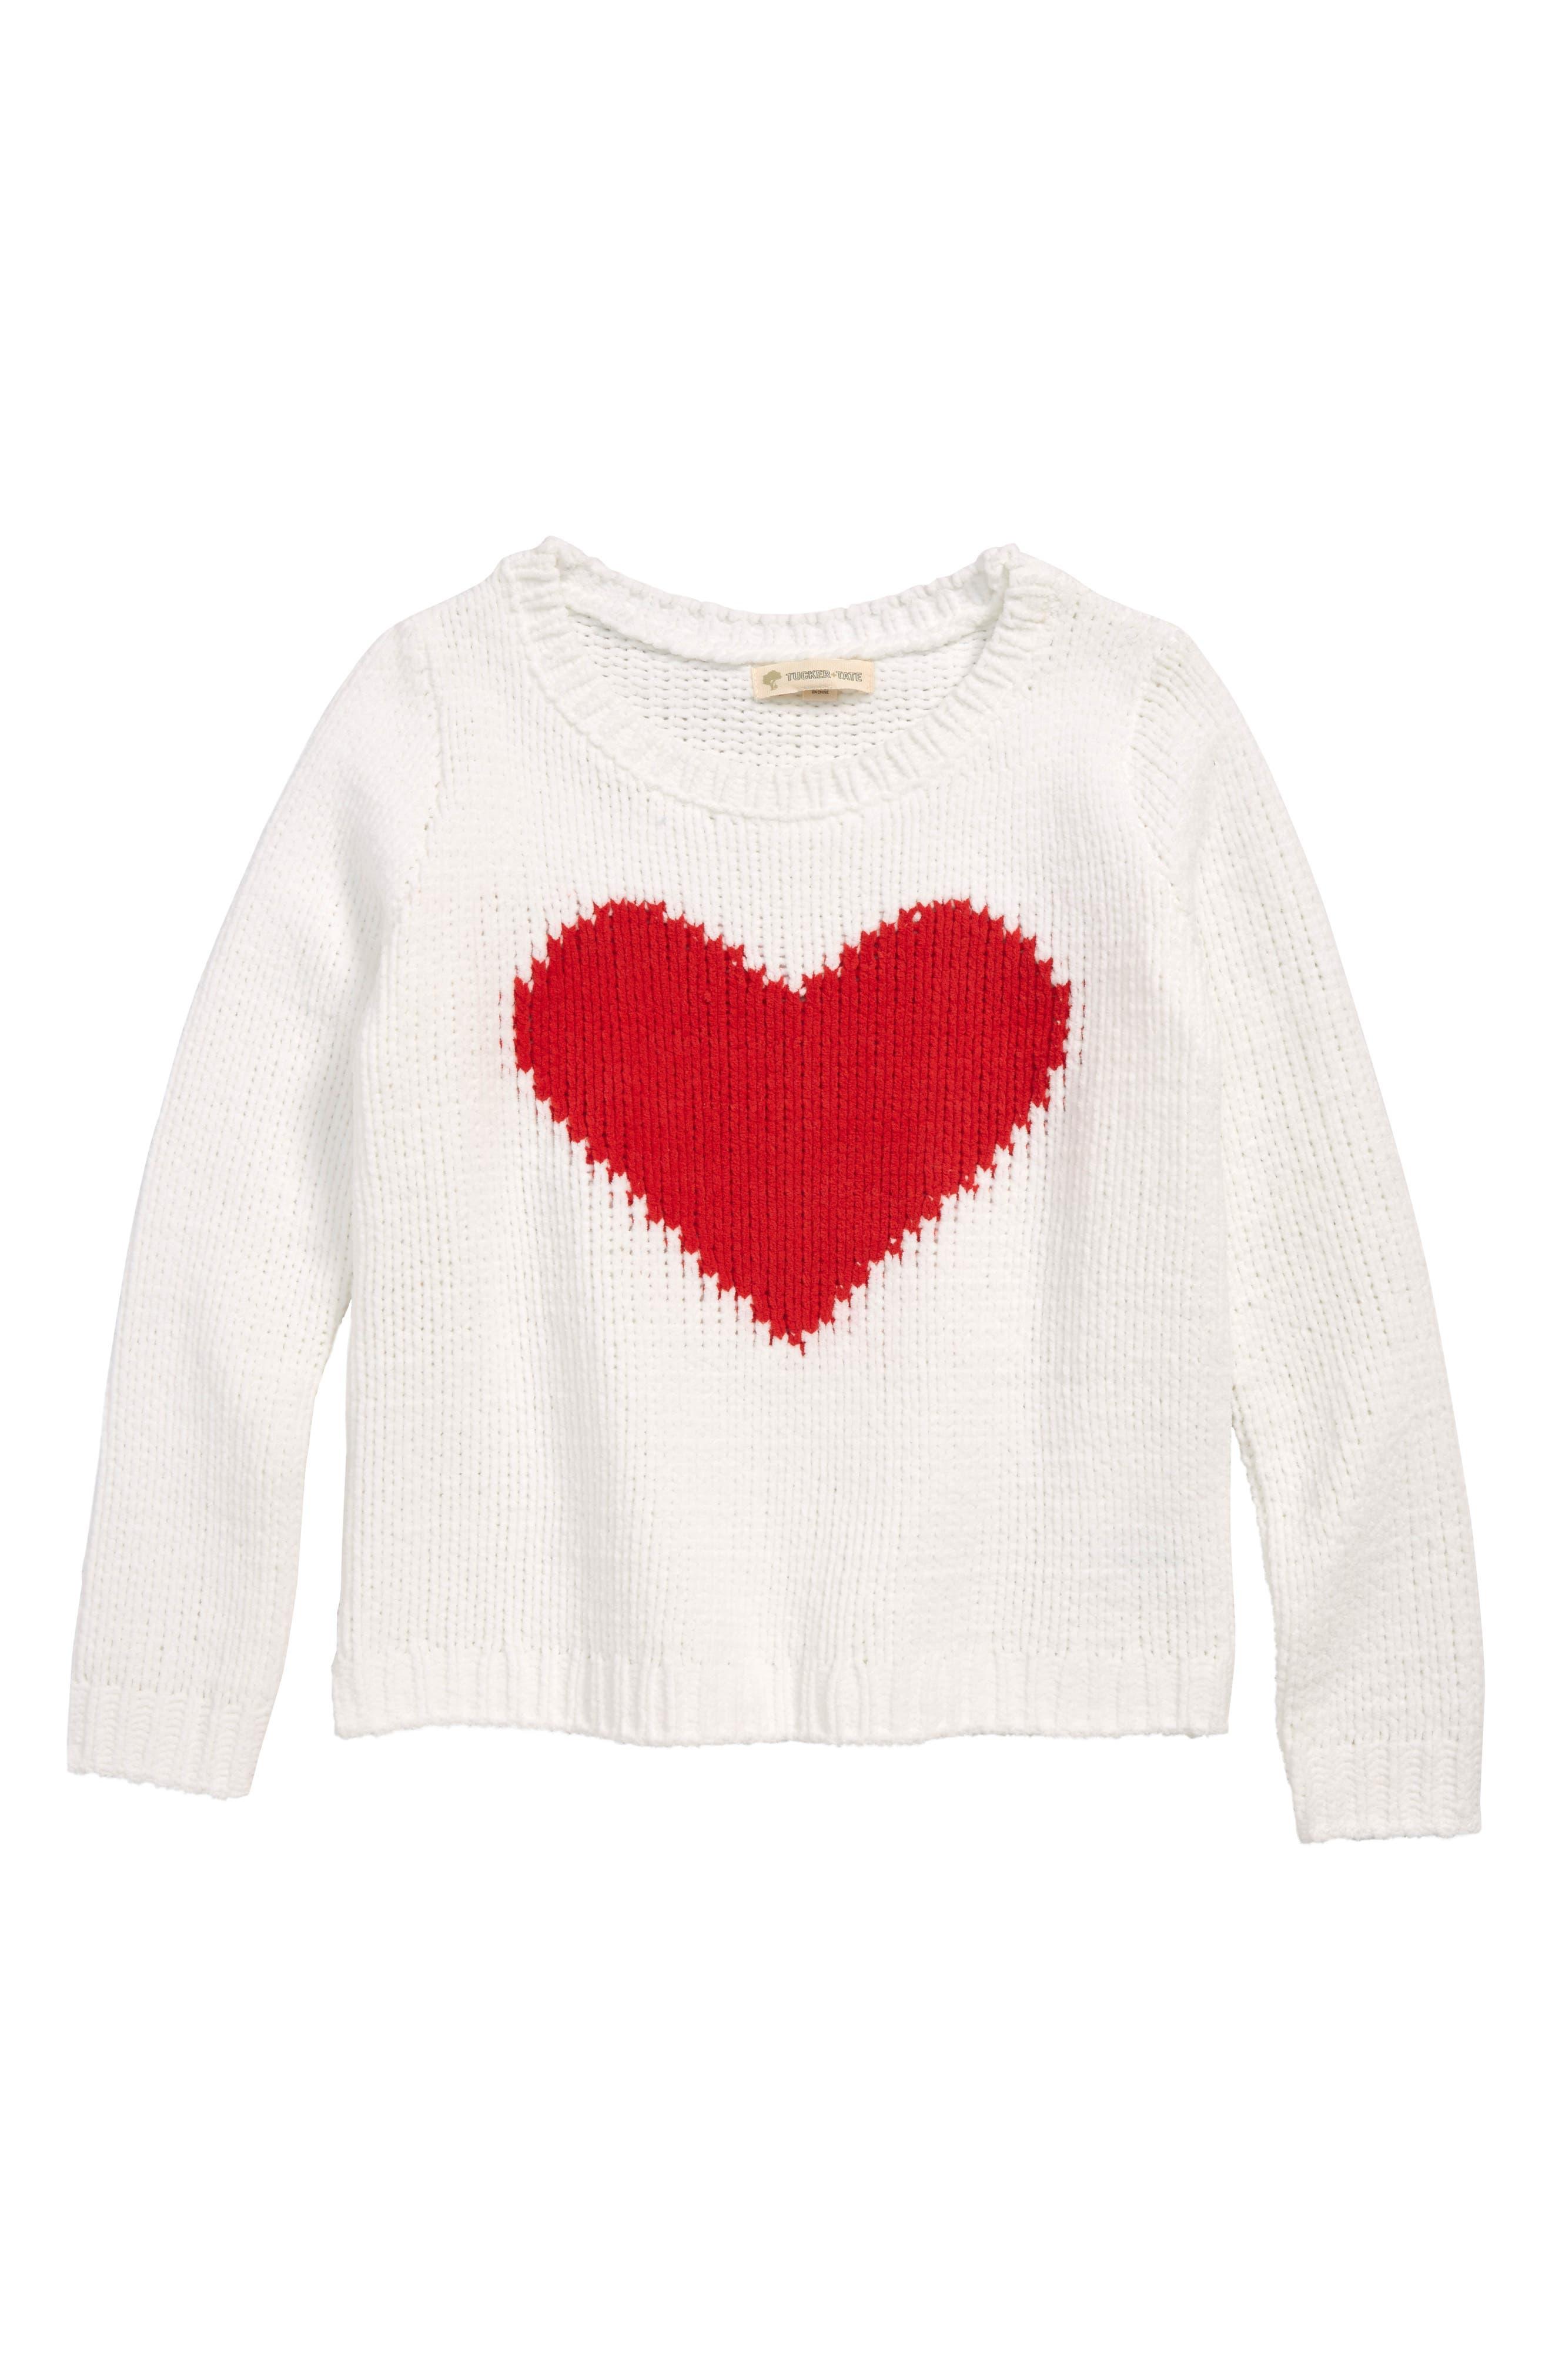 Girls Tucker  Tate Heart Plush Sweater Size 7  White